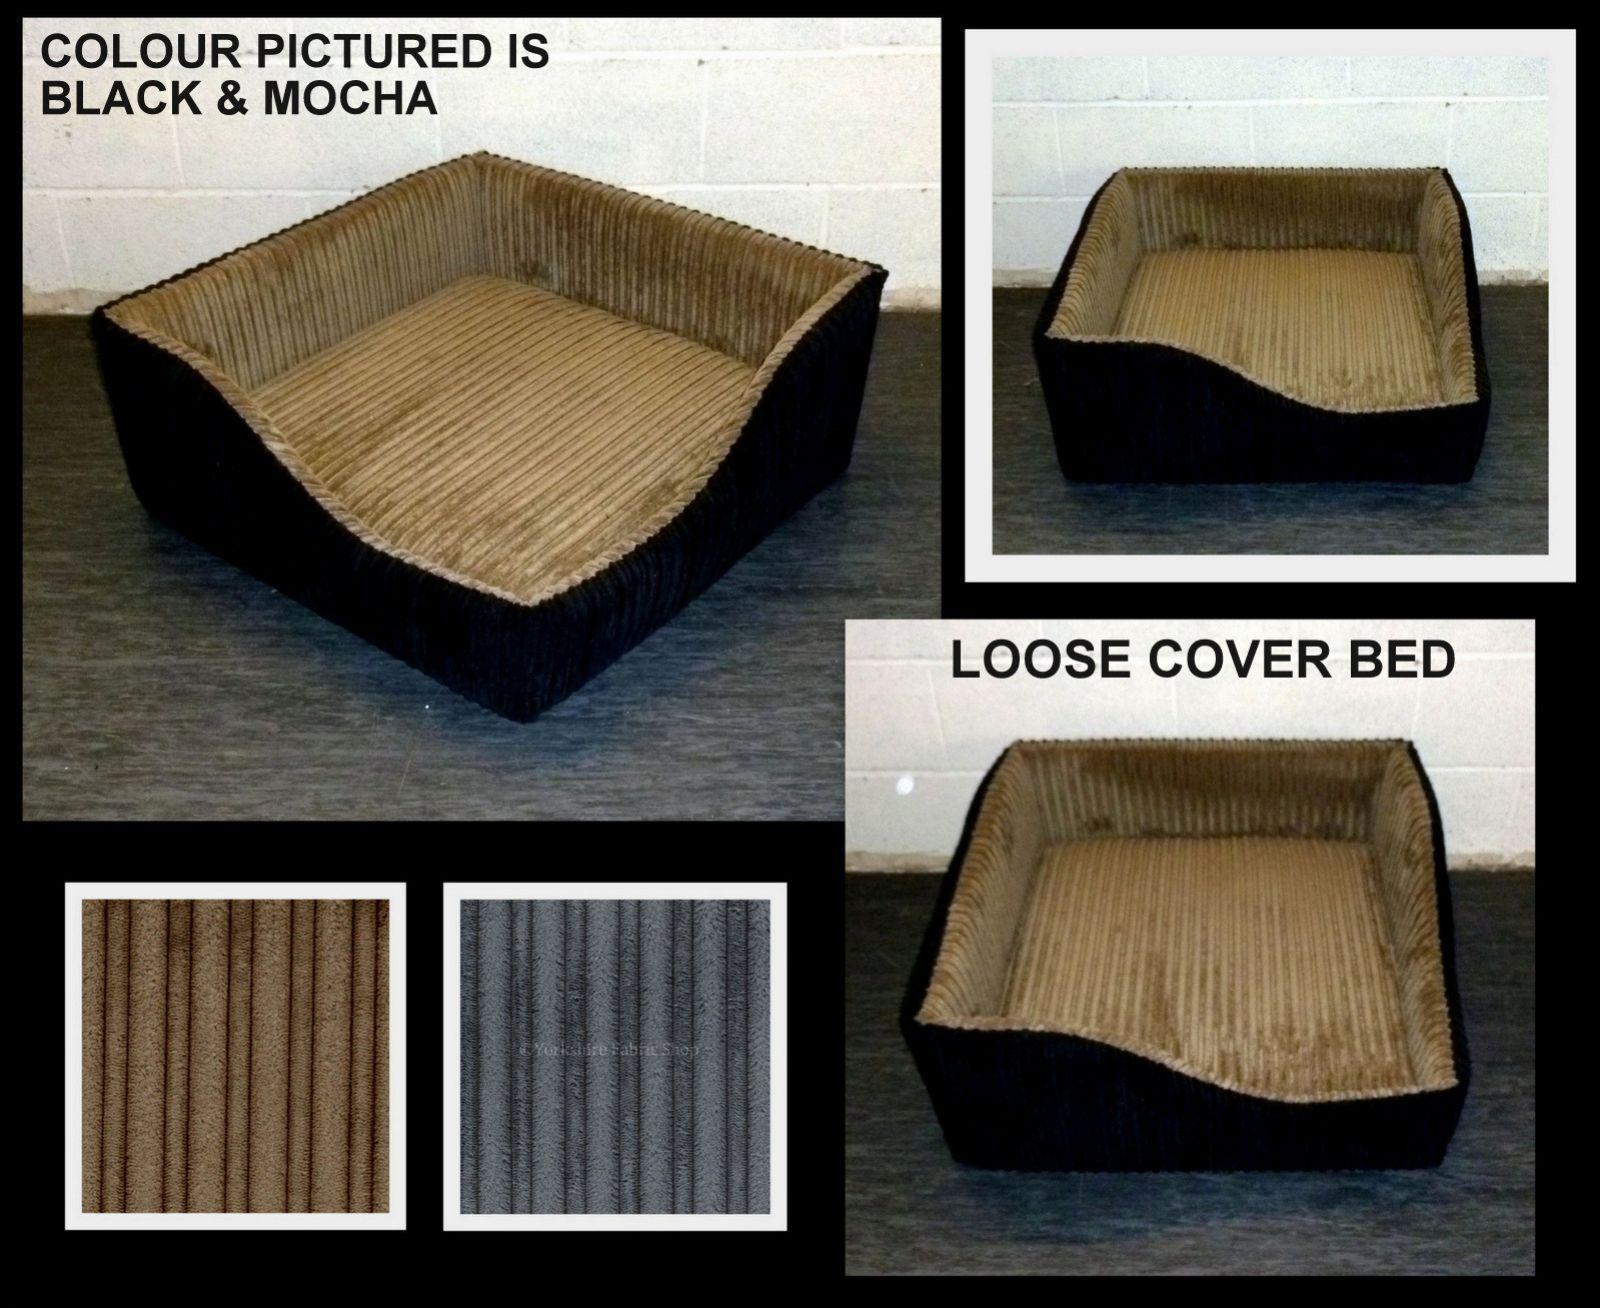 MEDIUM ZIPPY CORNER DOG BED WASHABLE JUMBO CORD 5  DEEP MATTRESS LOOSE COVERS